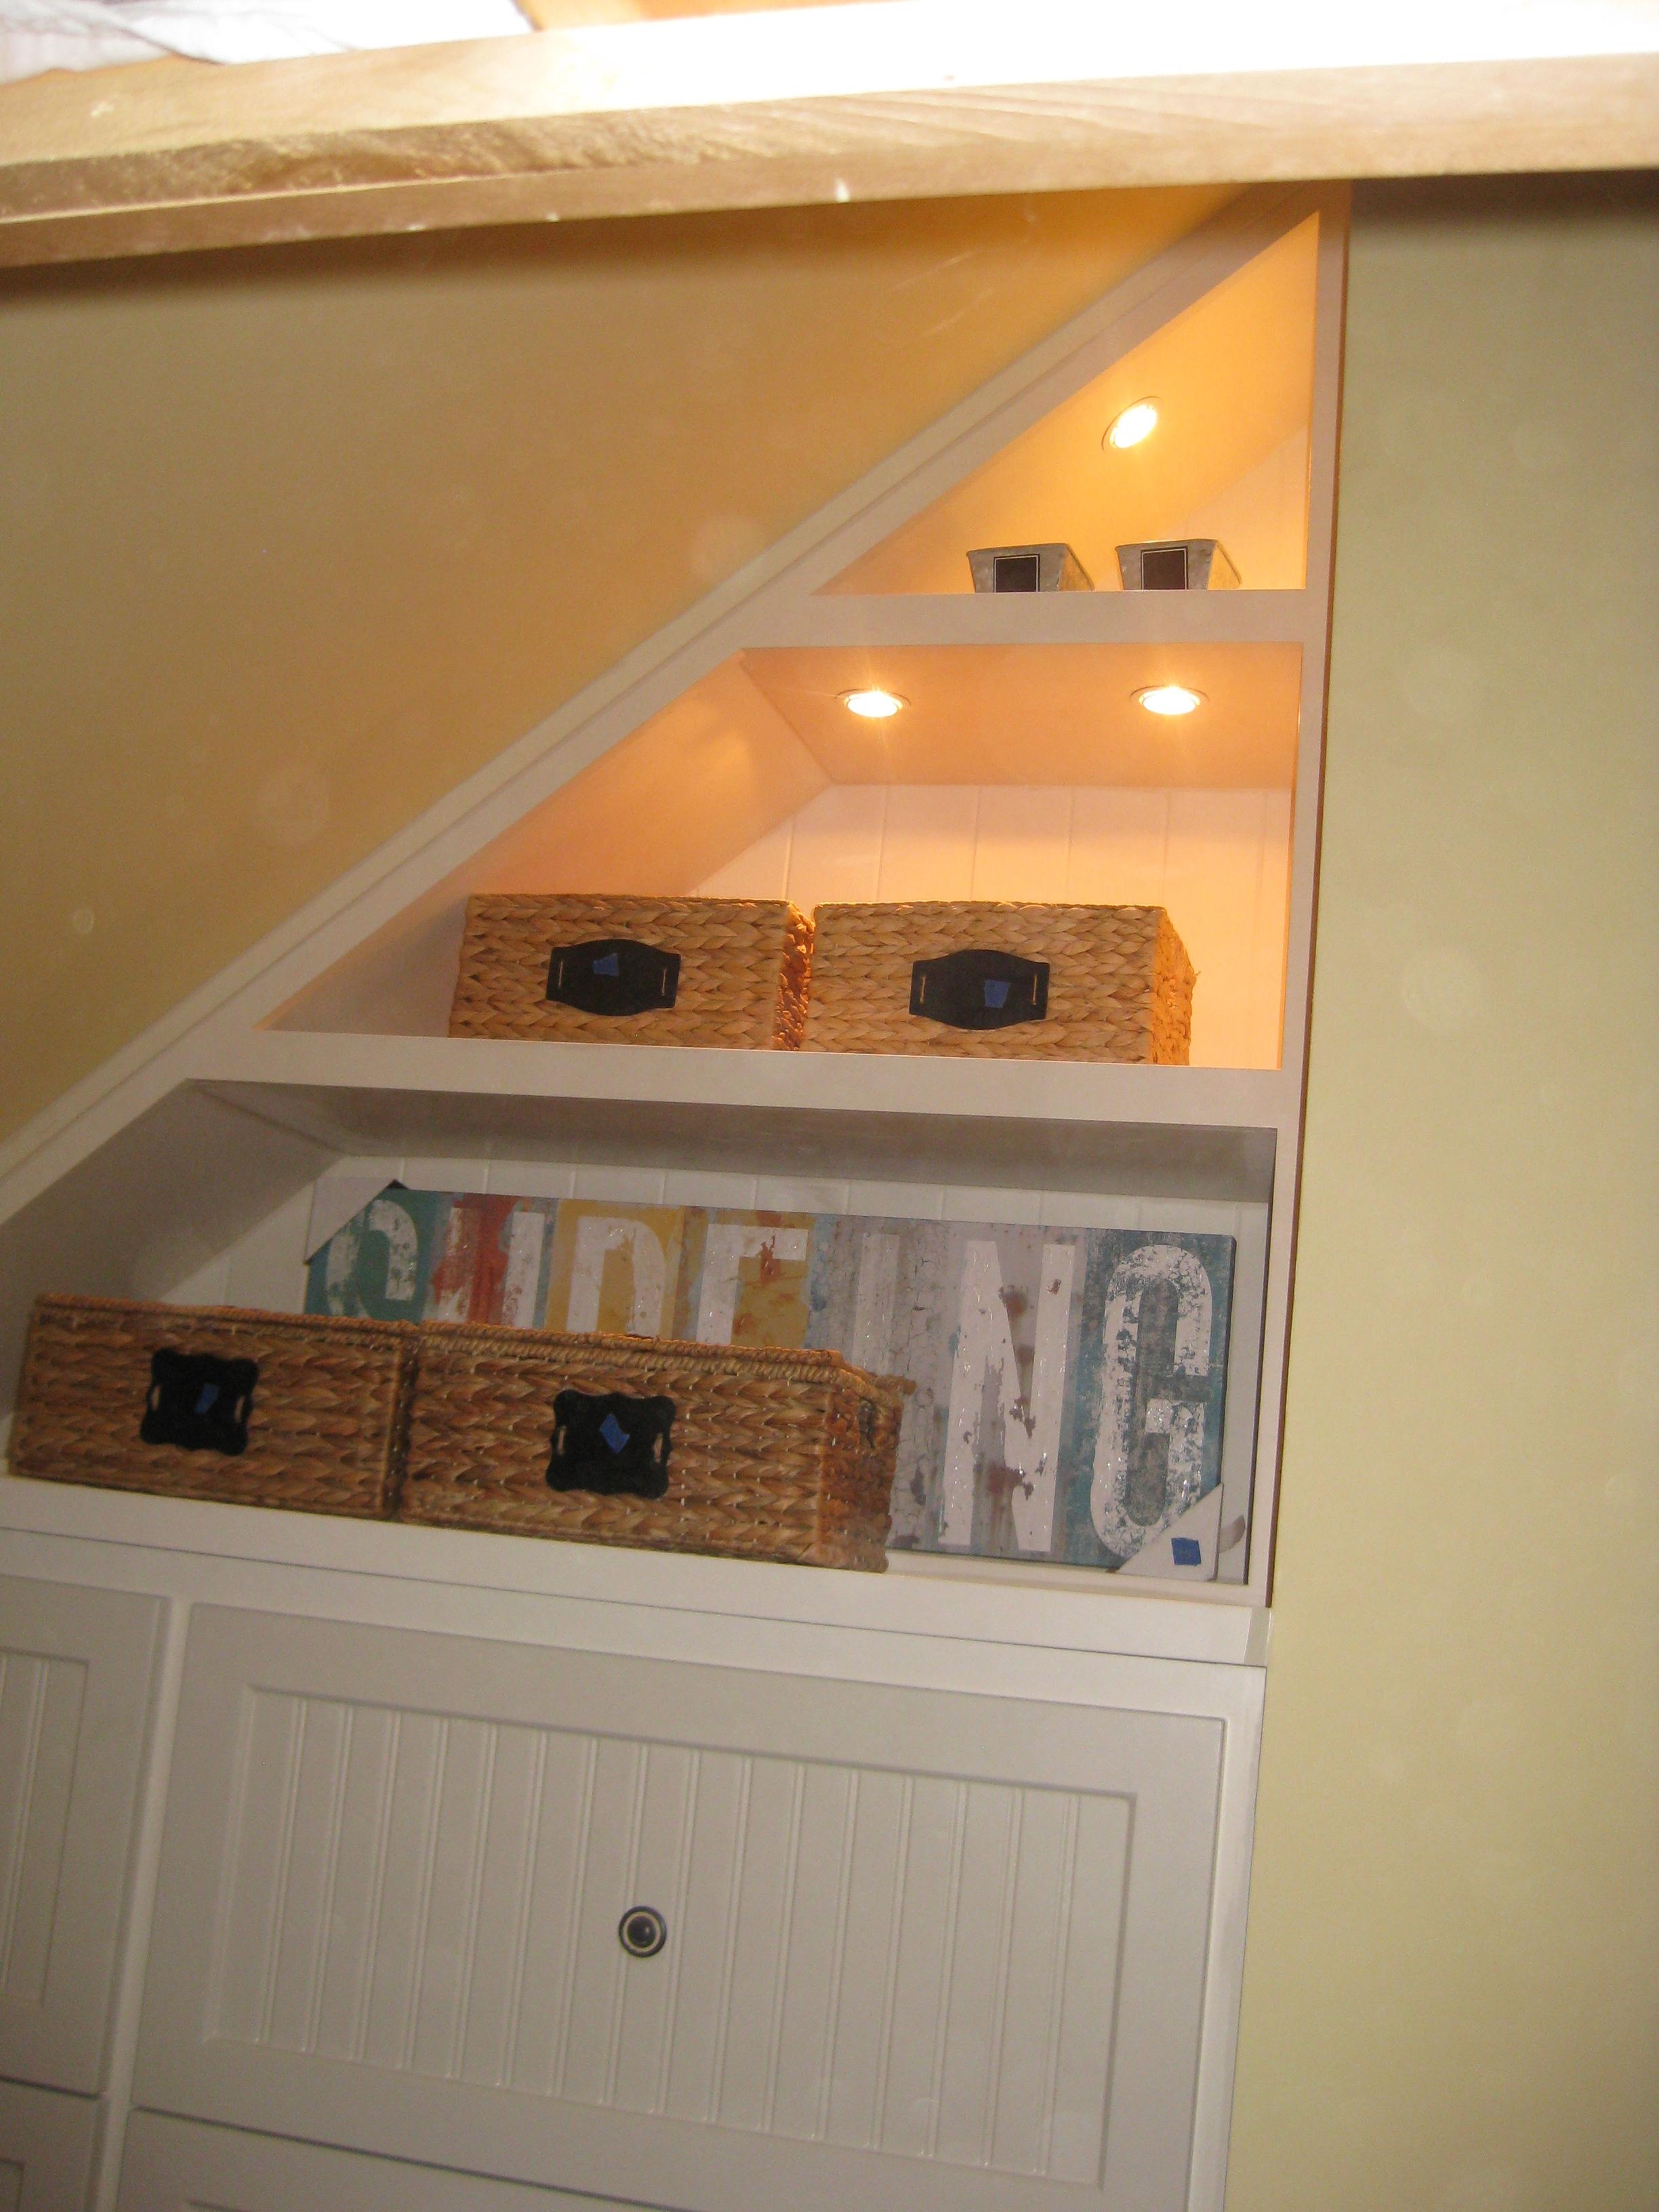 Angled Ceiling Cabinet - Dresser/Display